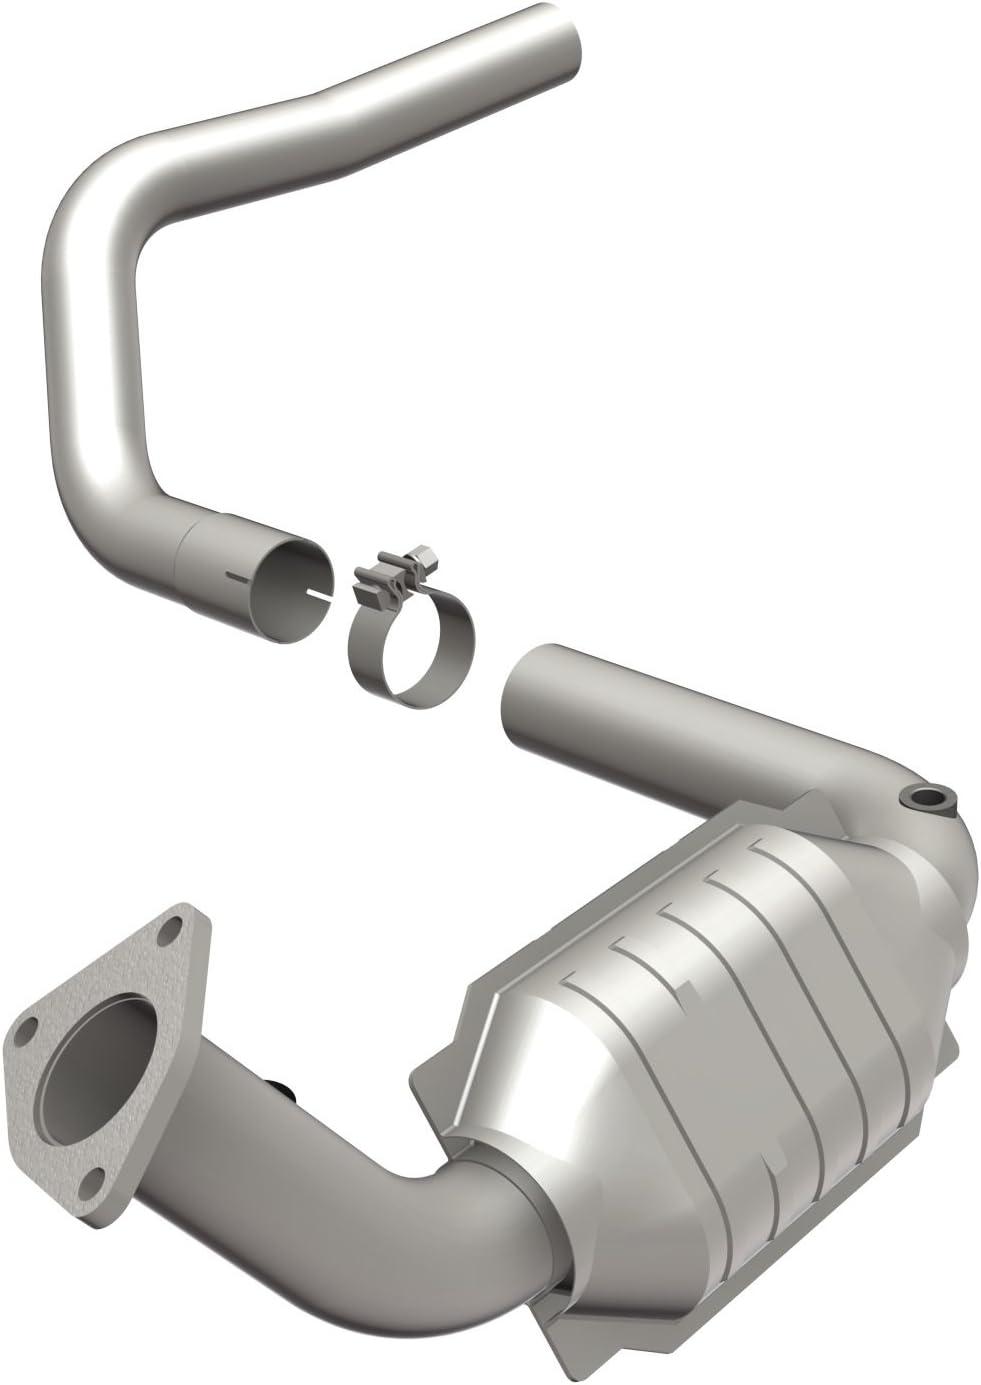 Non CARB compliant MagnaFlow 23882 Direct Fit Catalytic Converter